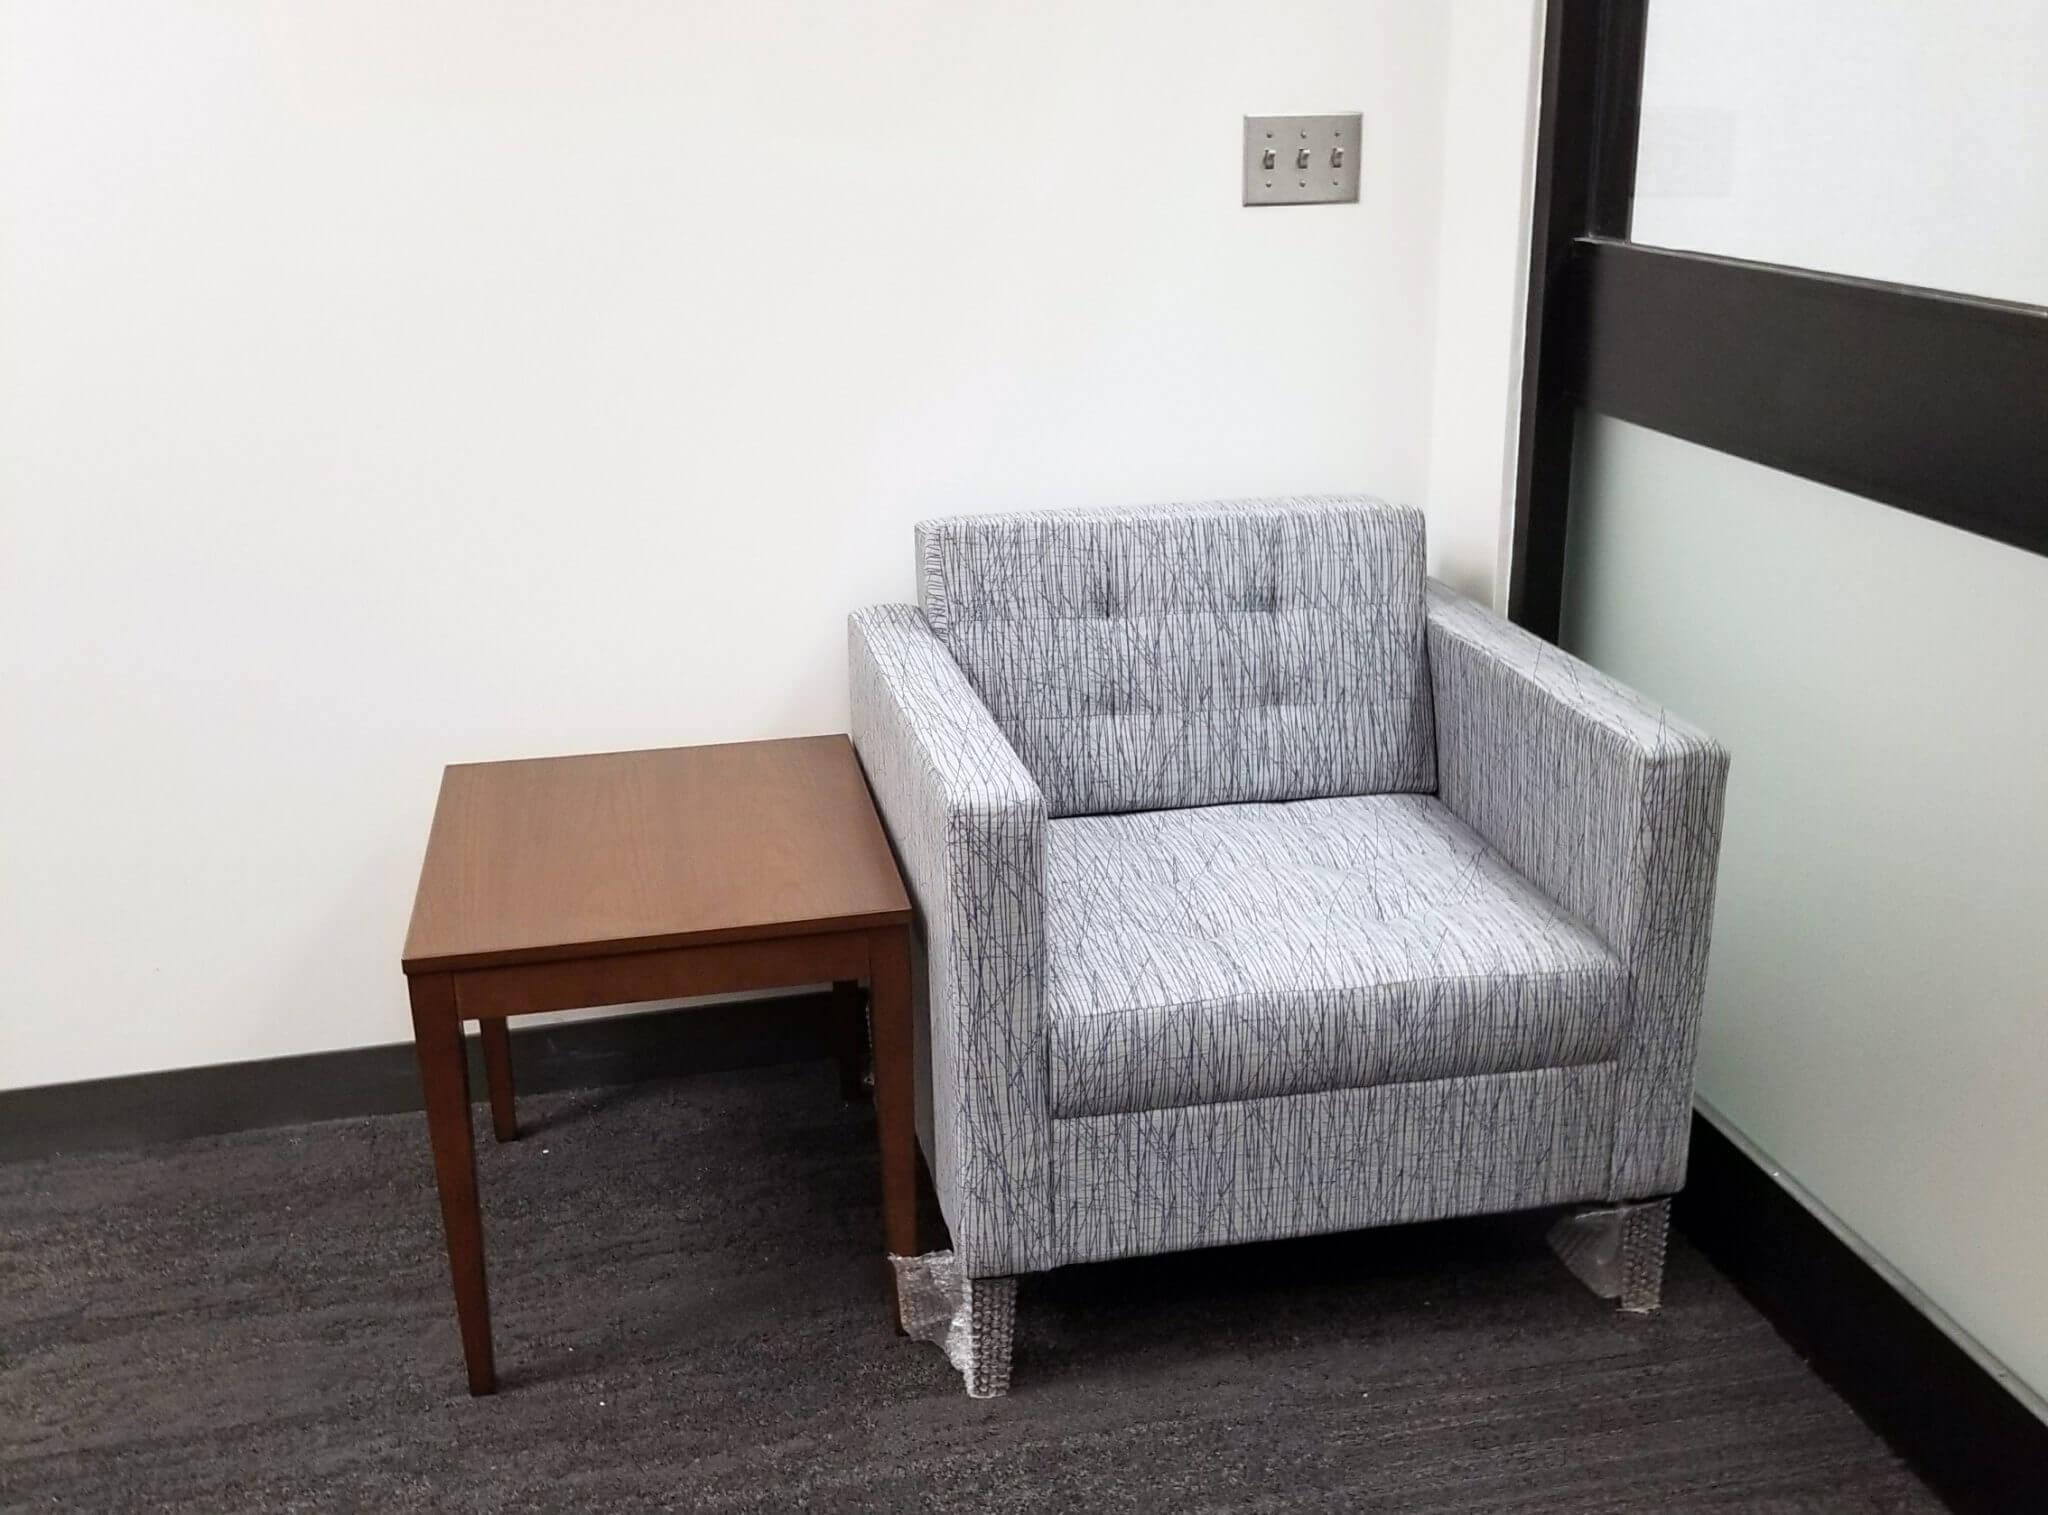 OPS TAC building Gunlocke Ciji chair National Eloquence table